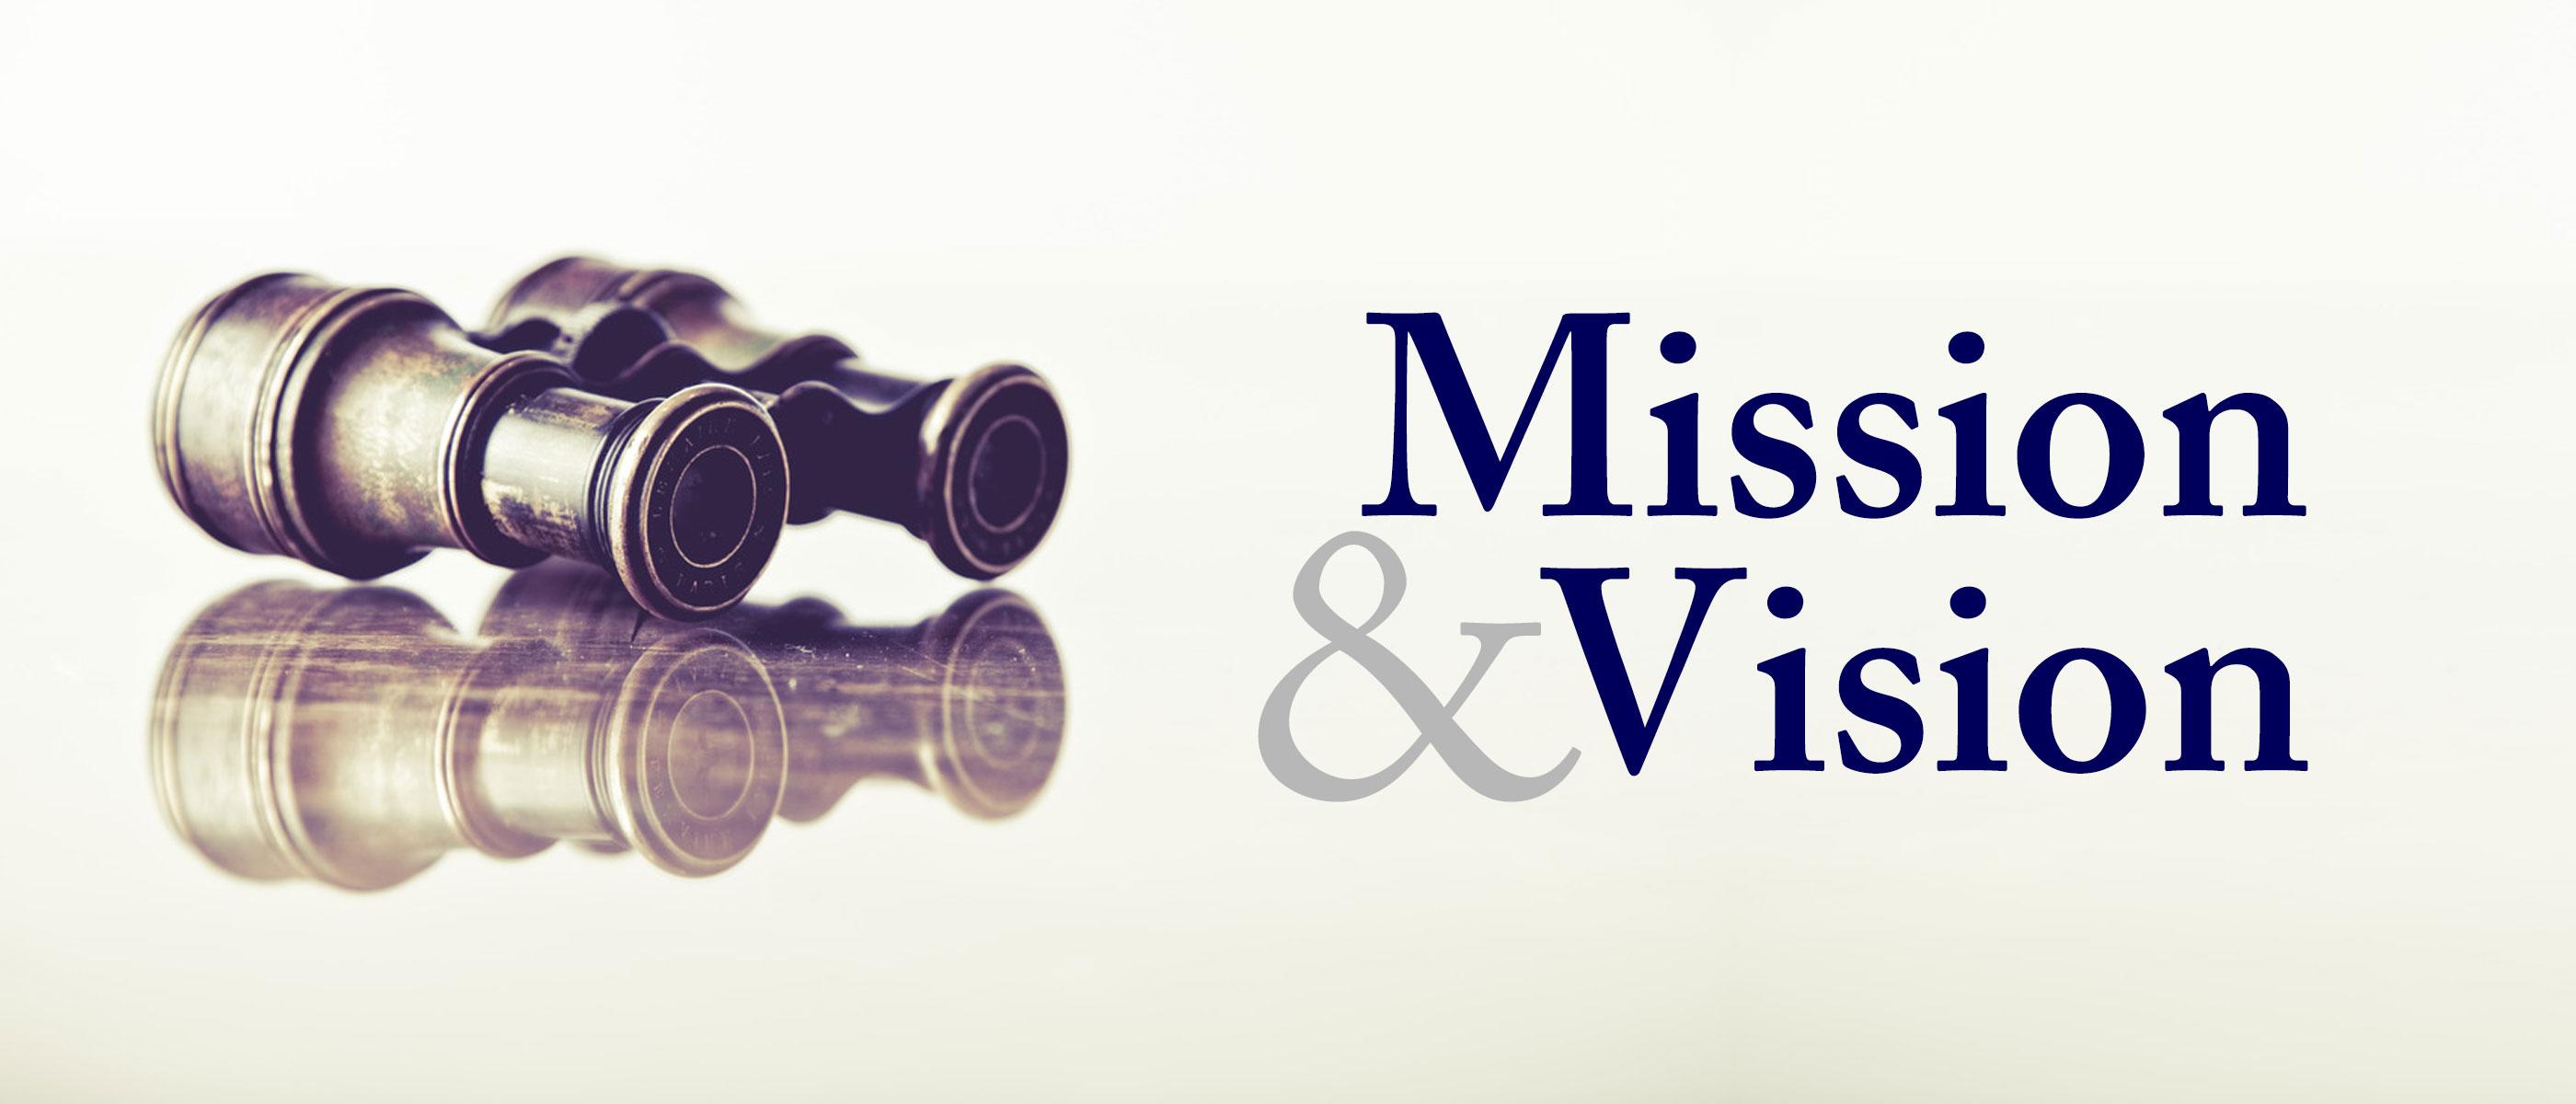 MissionVision_2800x1200